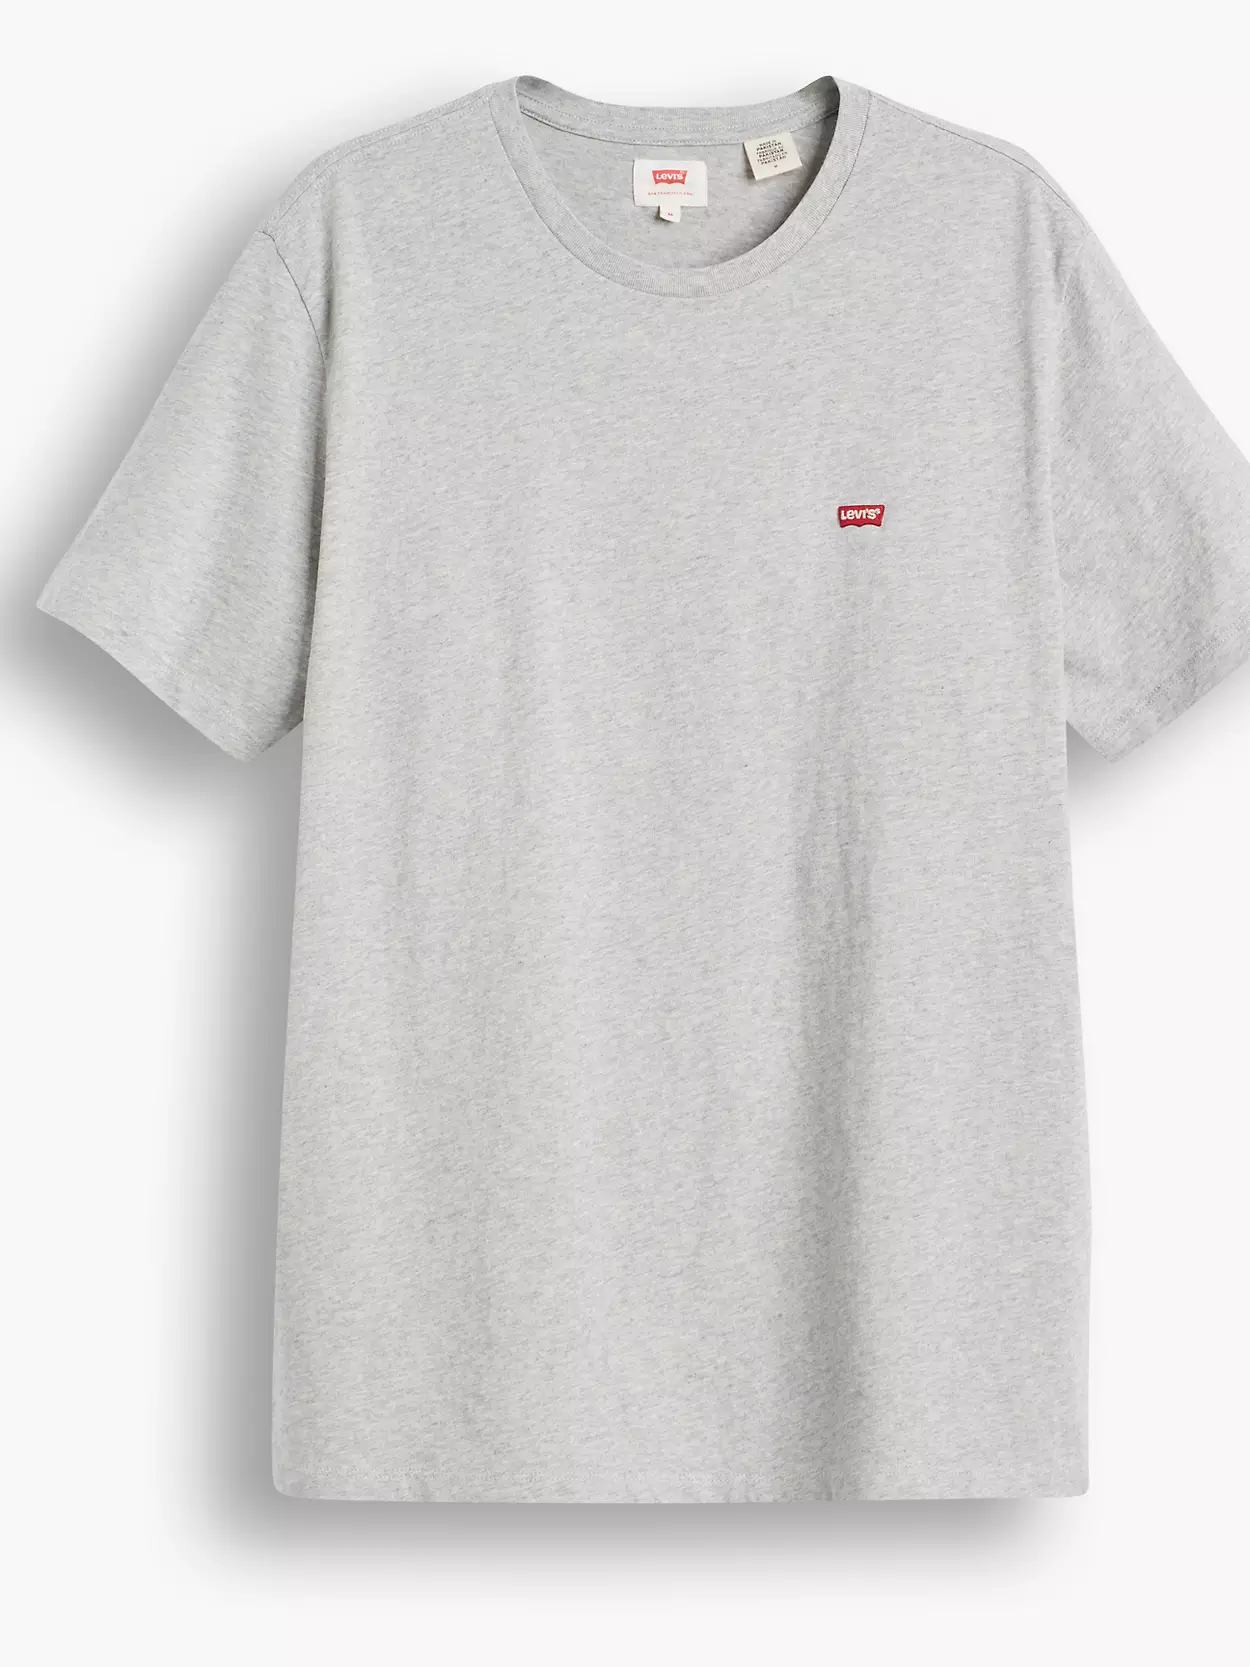 Levi's Original t-shirt